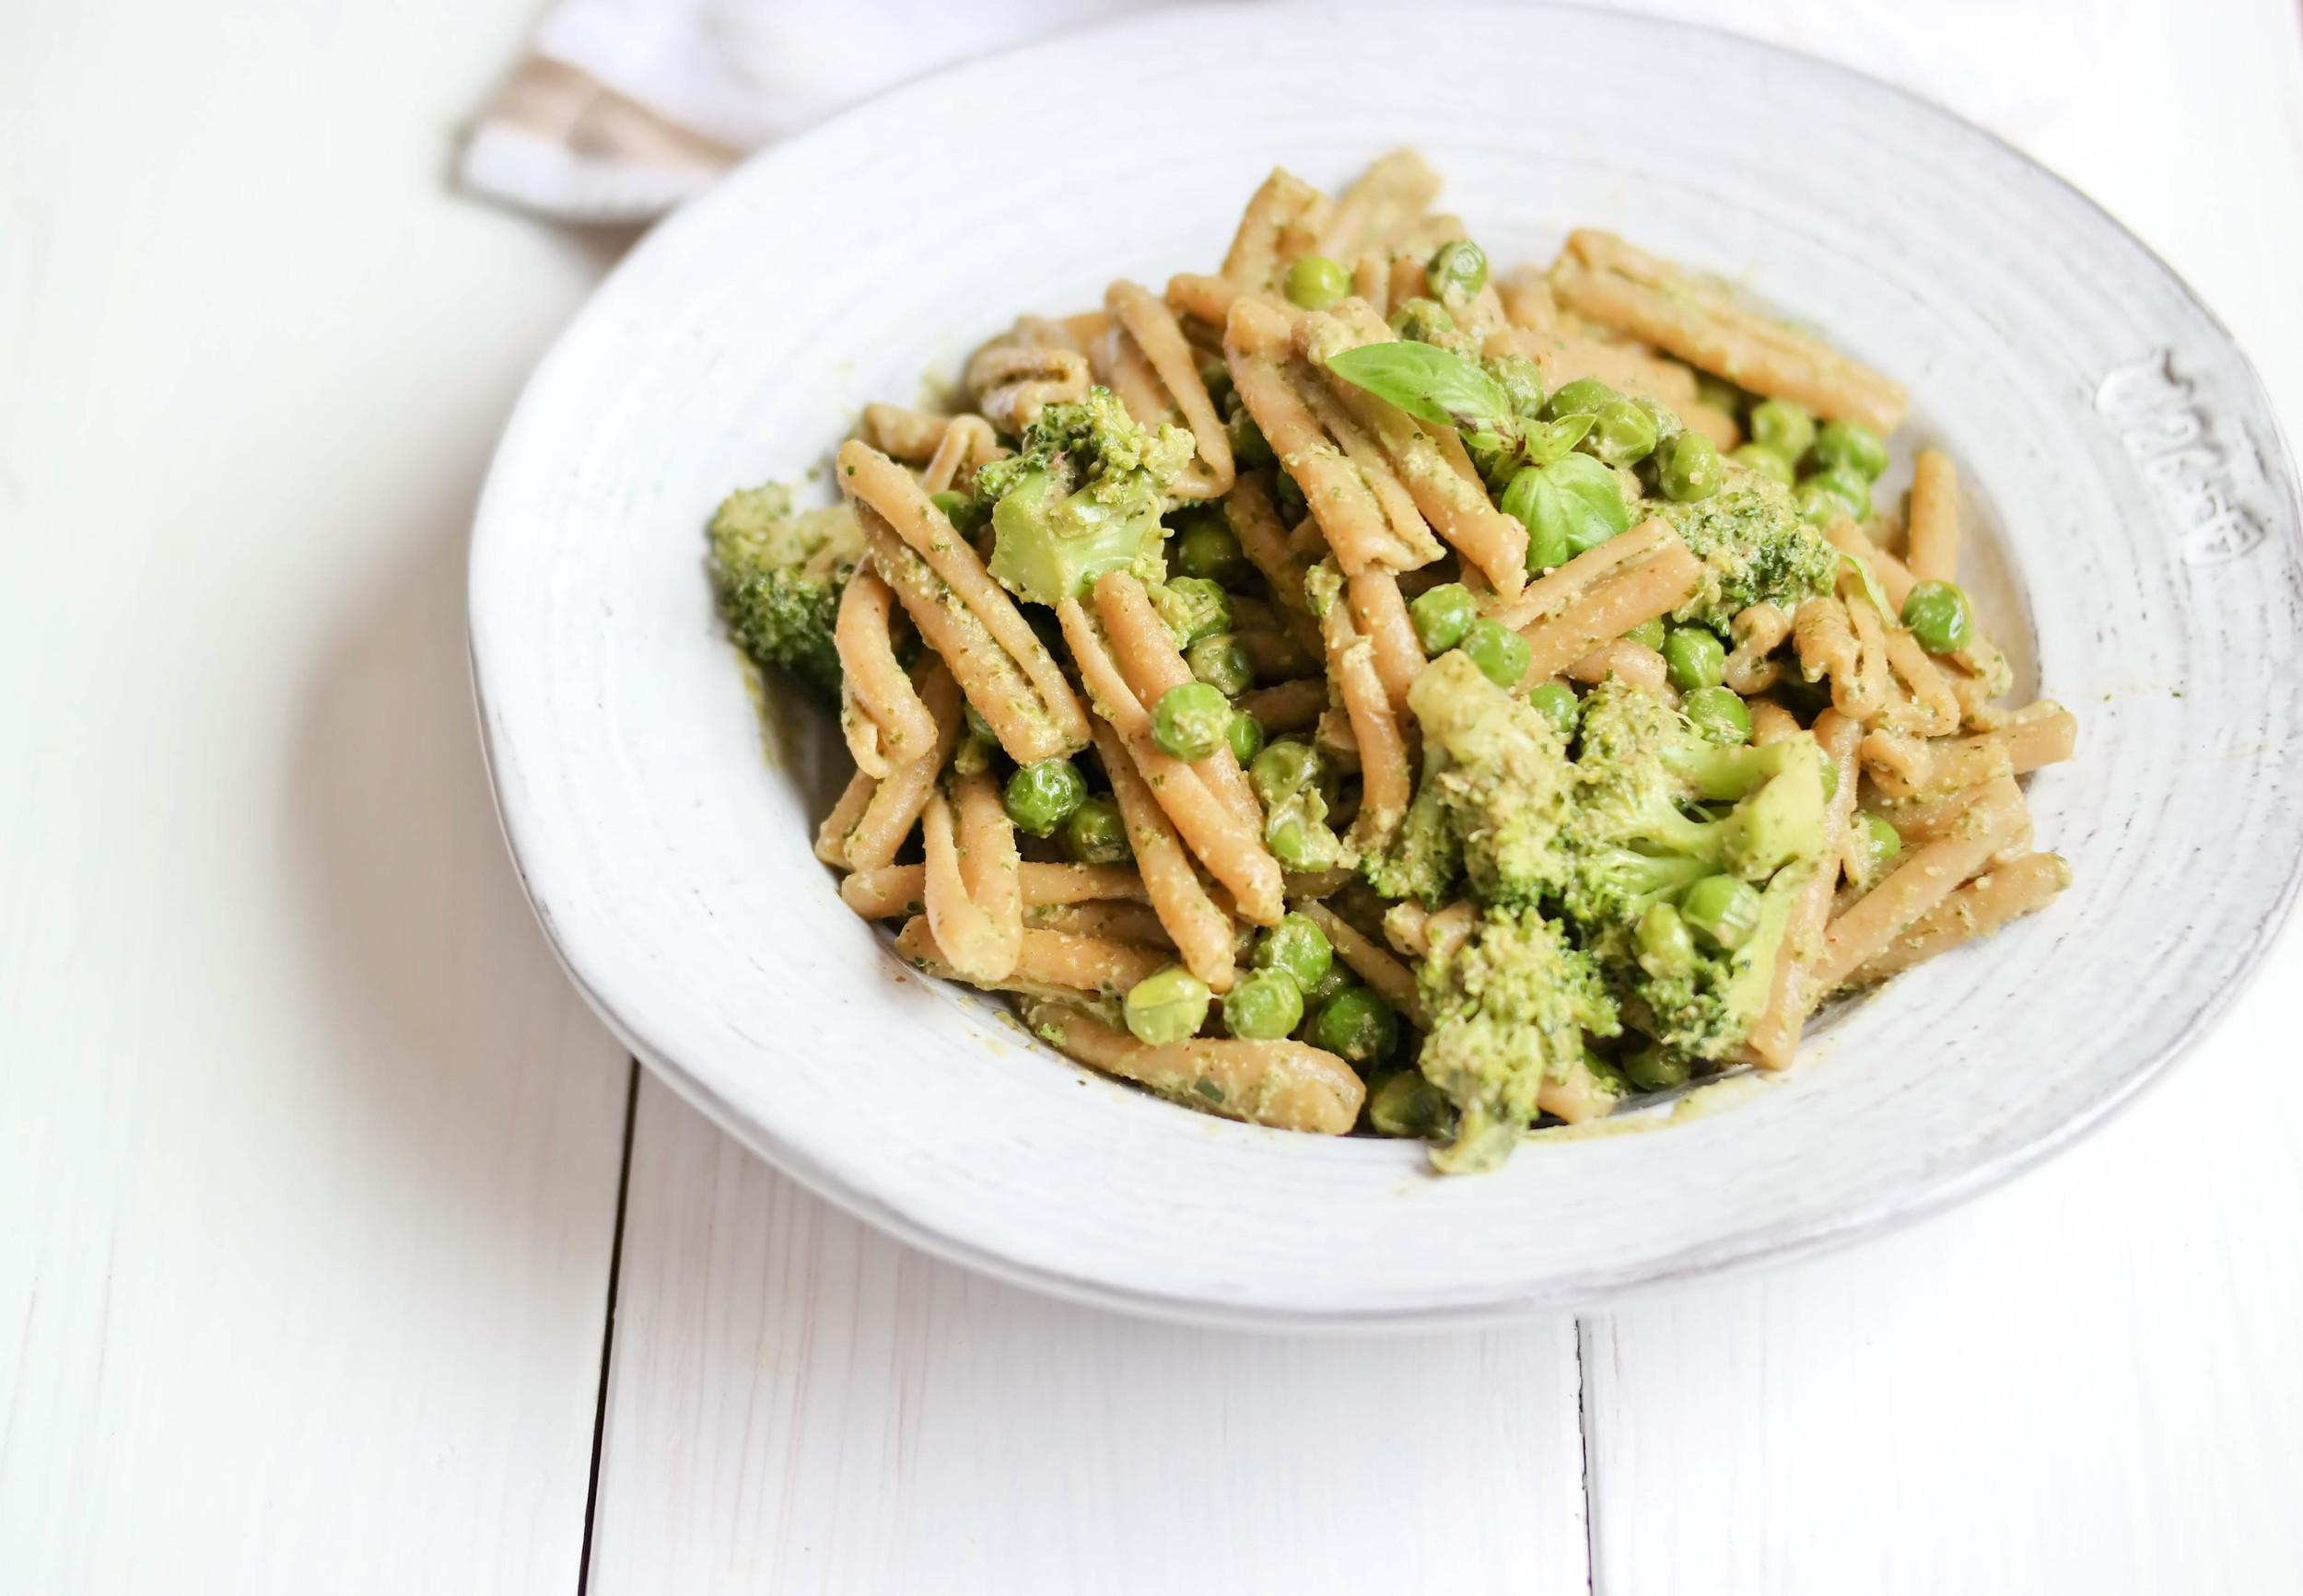 Pesto-Pasta-with-Peas-and-Broccoli | www.8thandlake.com